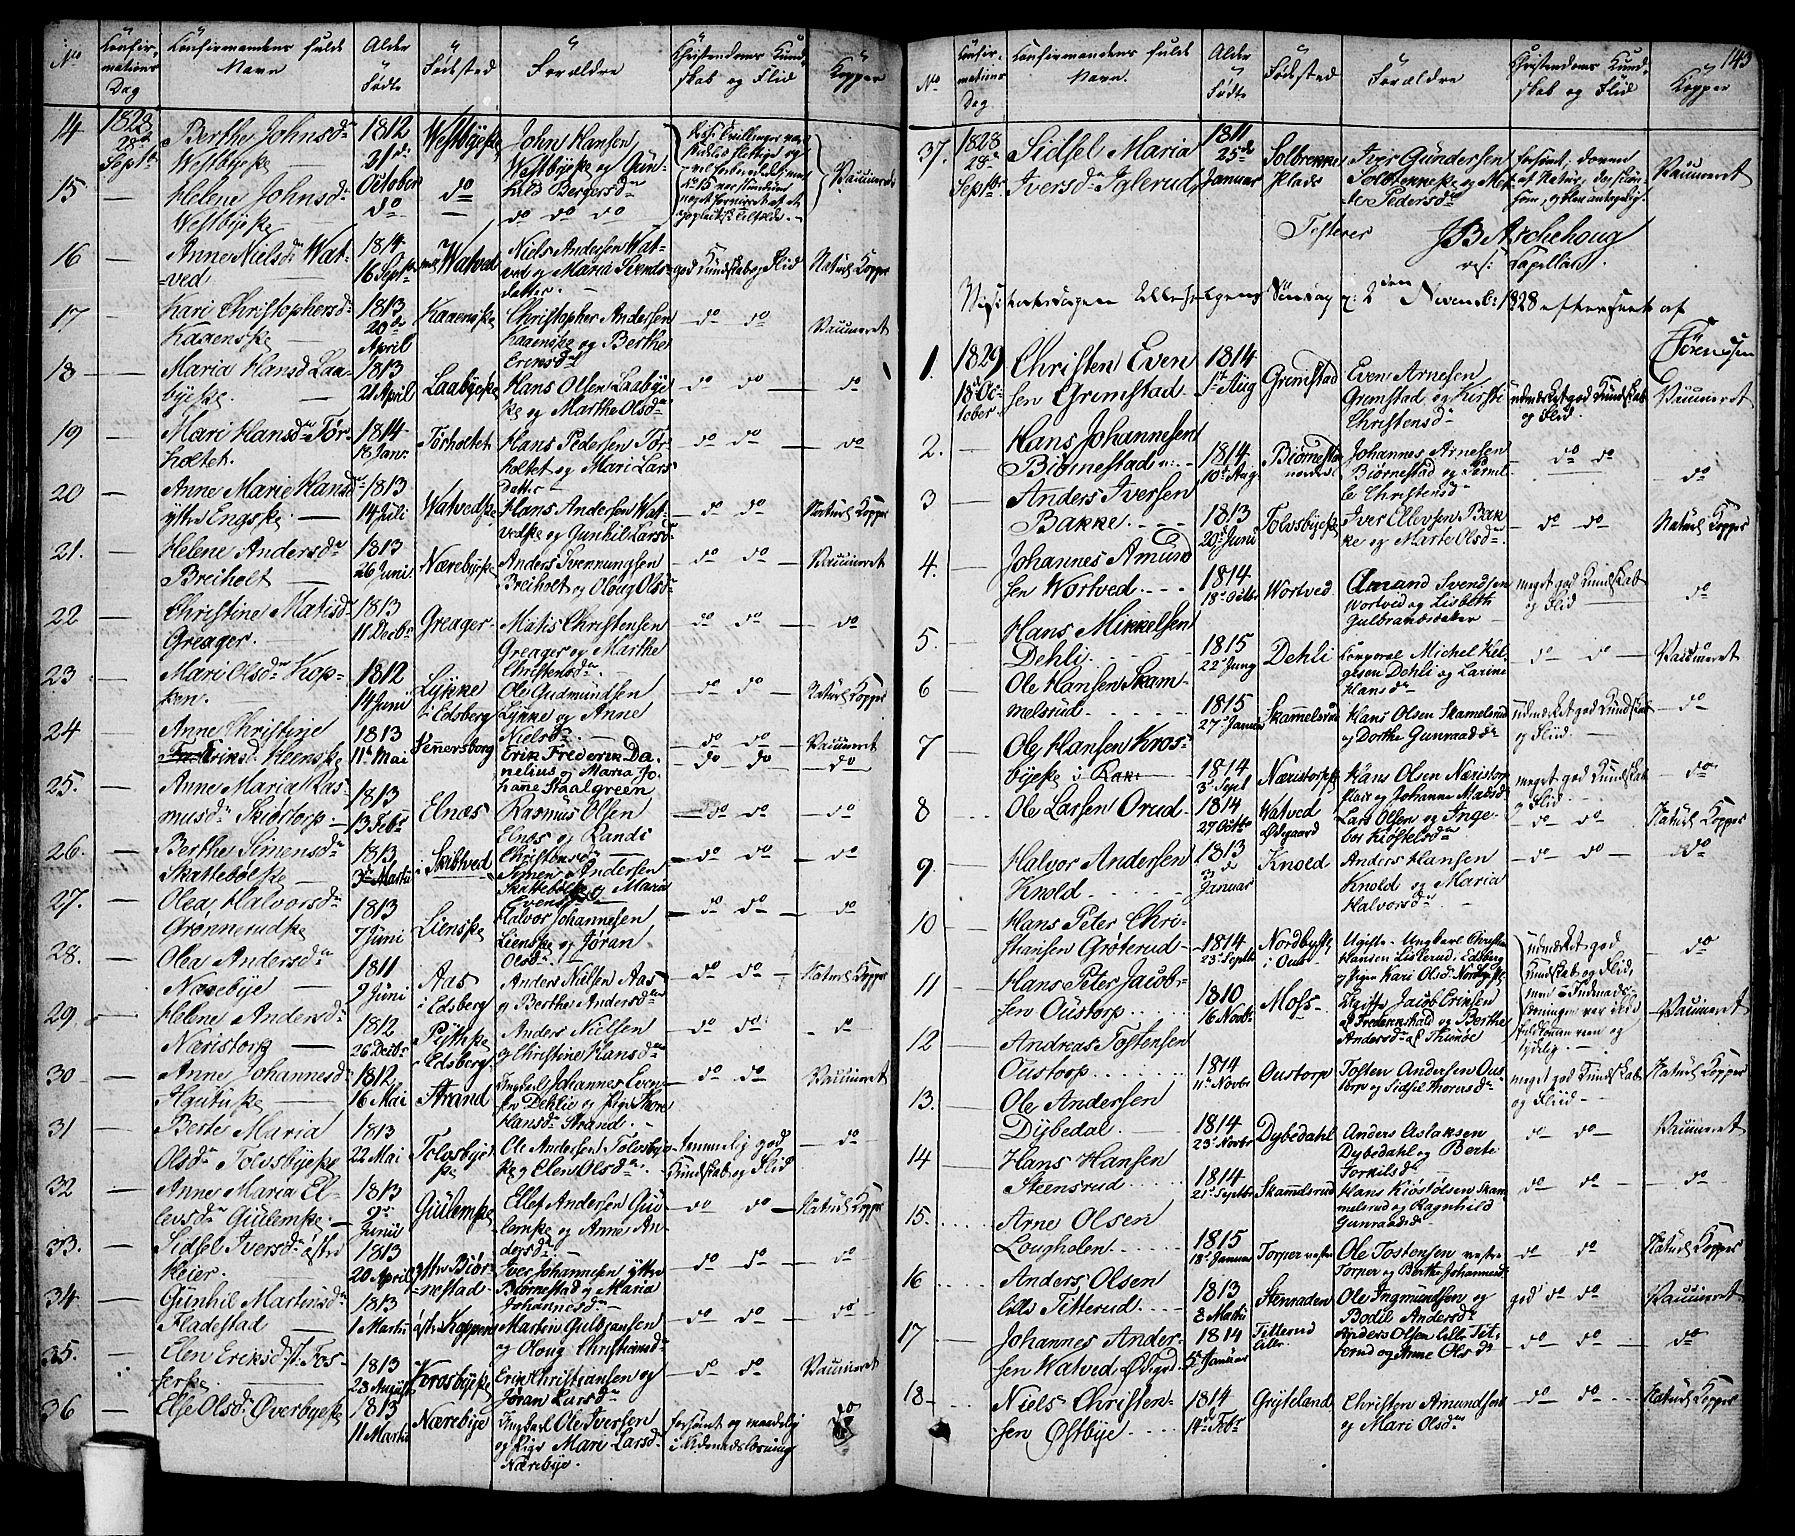 SAO, Rakkestad prestekontor Kirkebøker, F/Fa/L0007: Ministerialbok nr. I 7, 1825-1841, s. 143